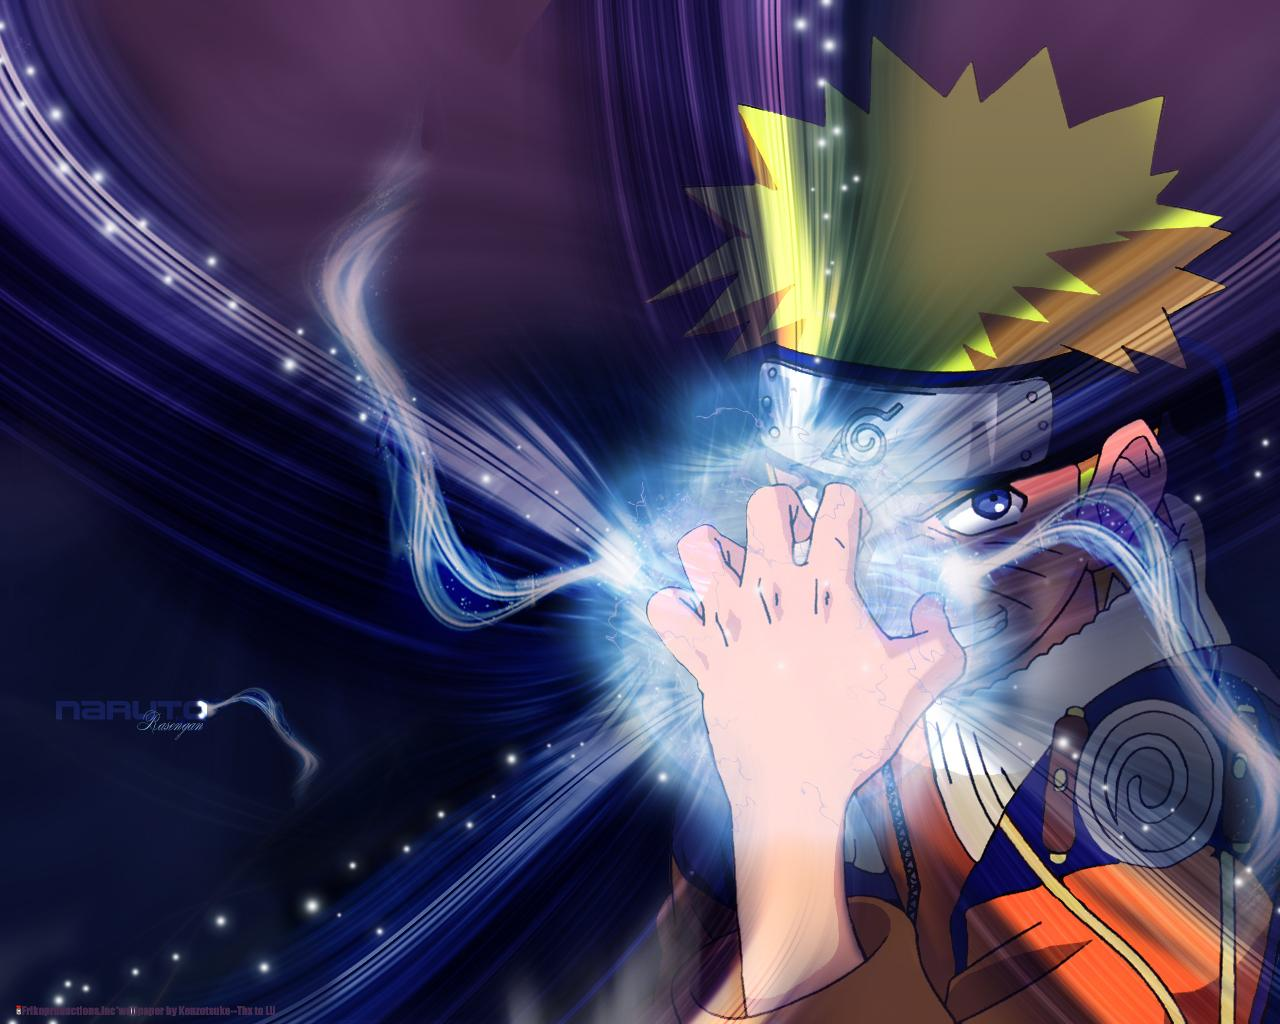 http://2.bp.blogspot.com/-oEjjkcDhVOE/Tfofi3_TdrI/AAAAAAAABLI/NpSZ5KXHG0c/s1600/Naruto+%25283%2529.jpg